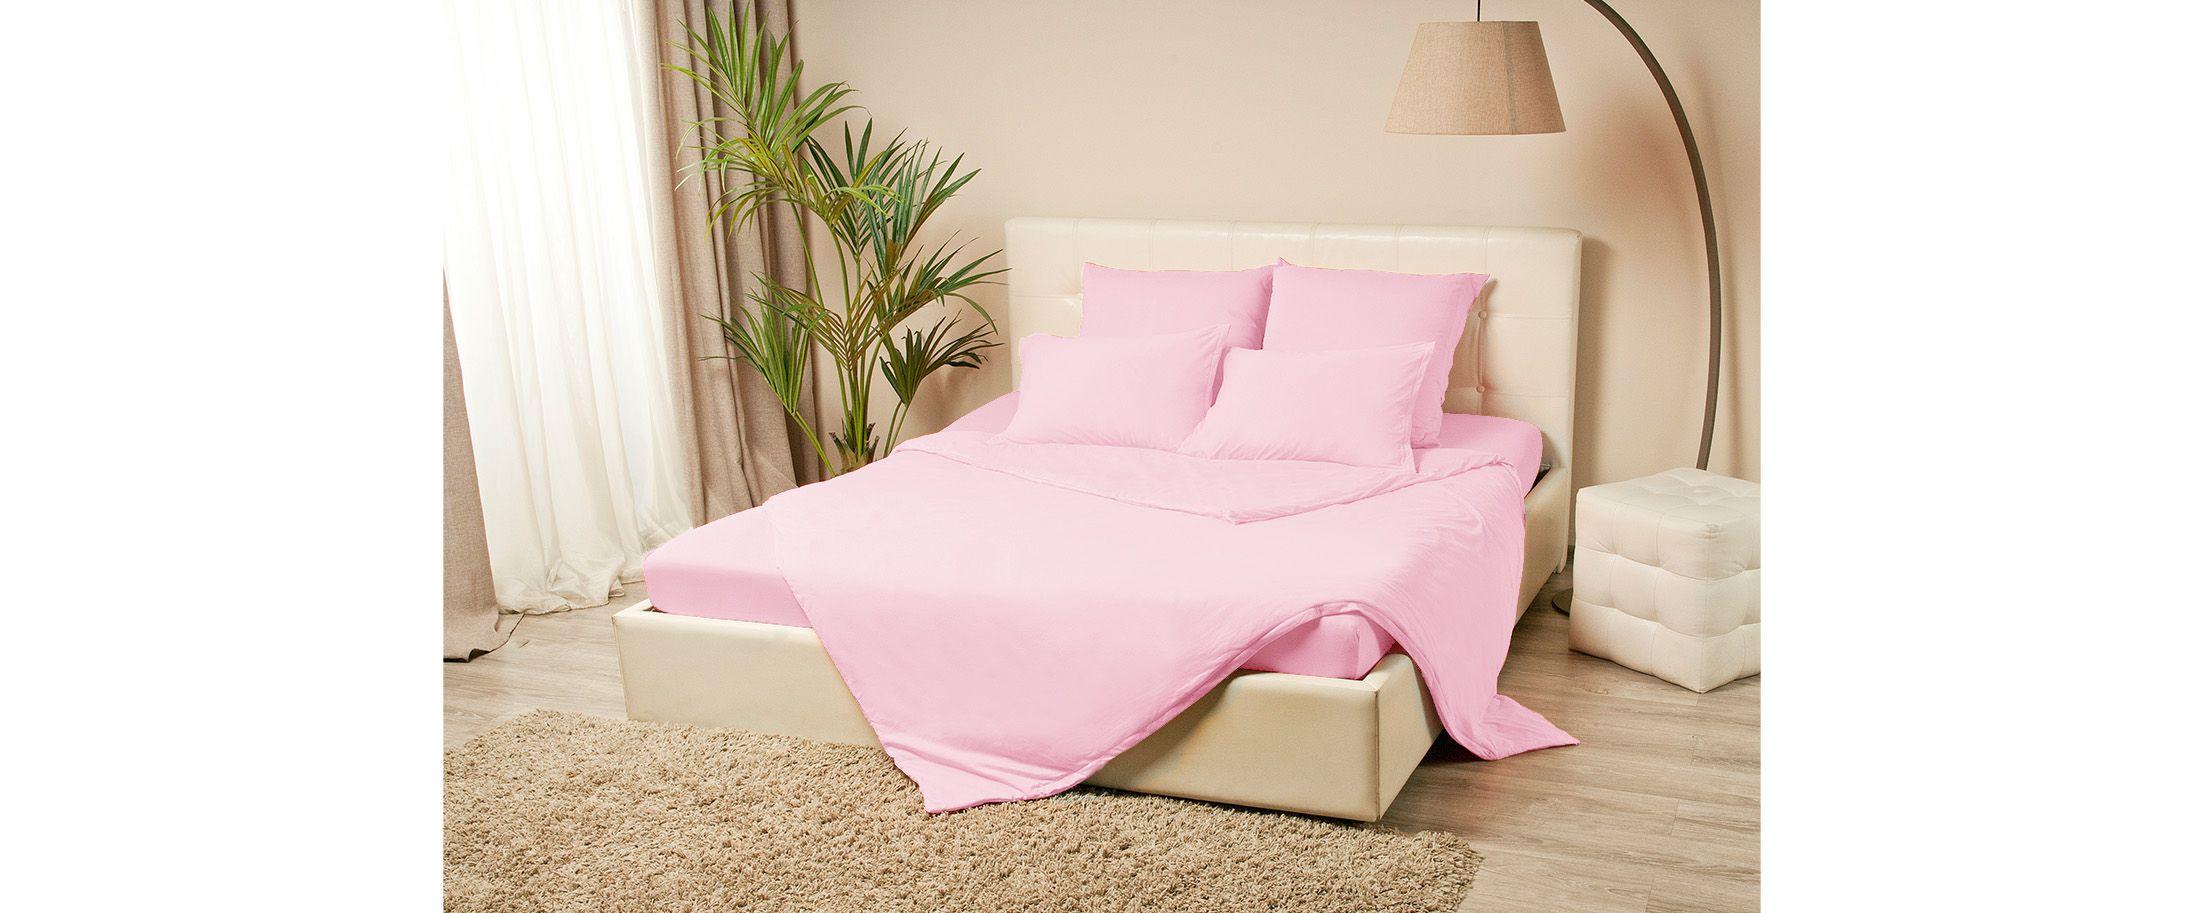 Простыня трикотажная на резинке 140х200 розового цвета Violett Модель 4000Простыня трикотажная на резинке 140х200 Violett Модель 4000. Артикул К000630<br>